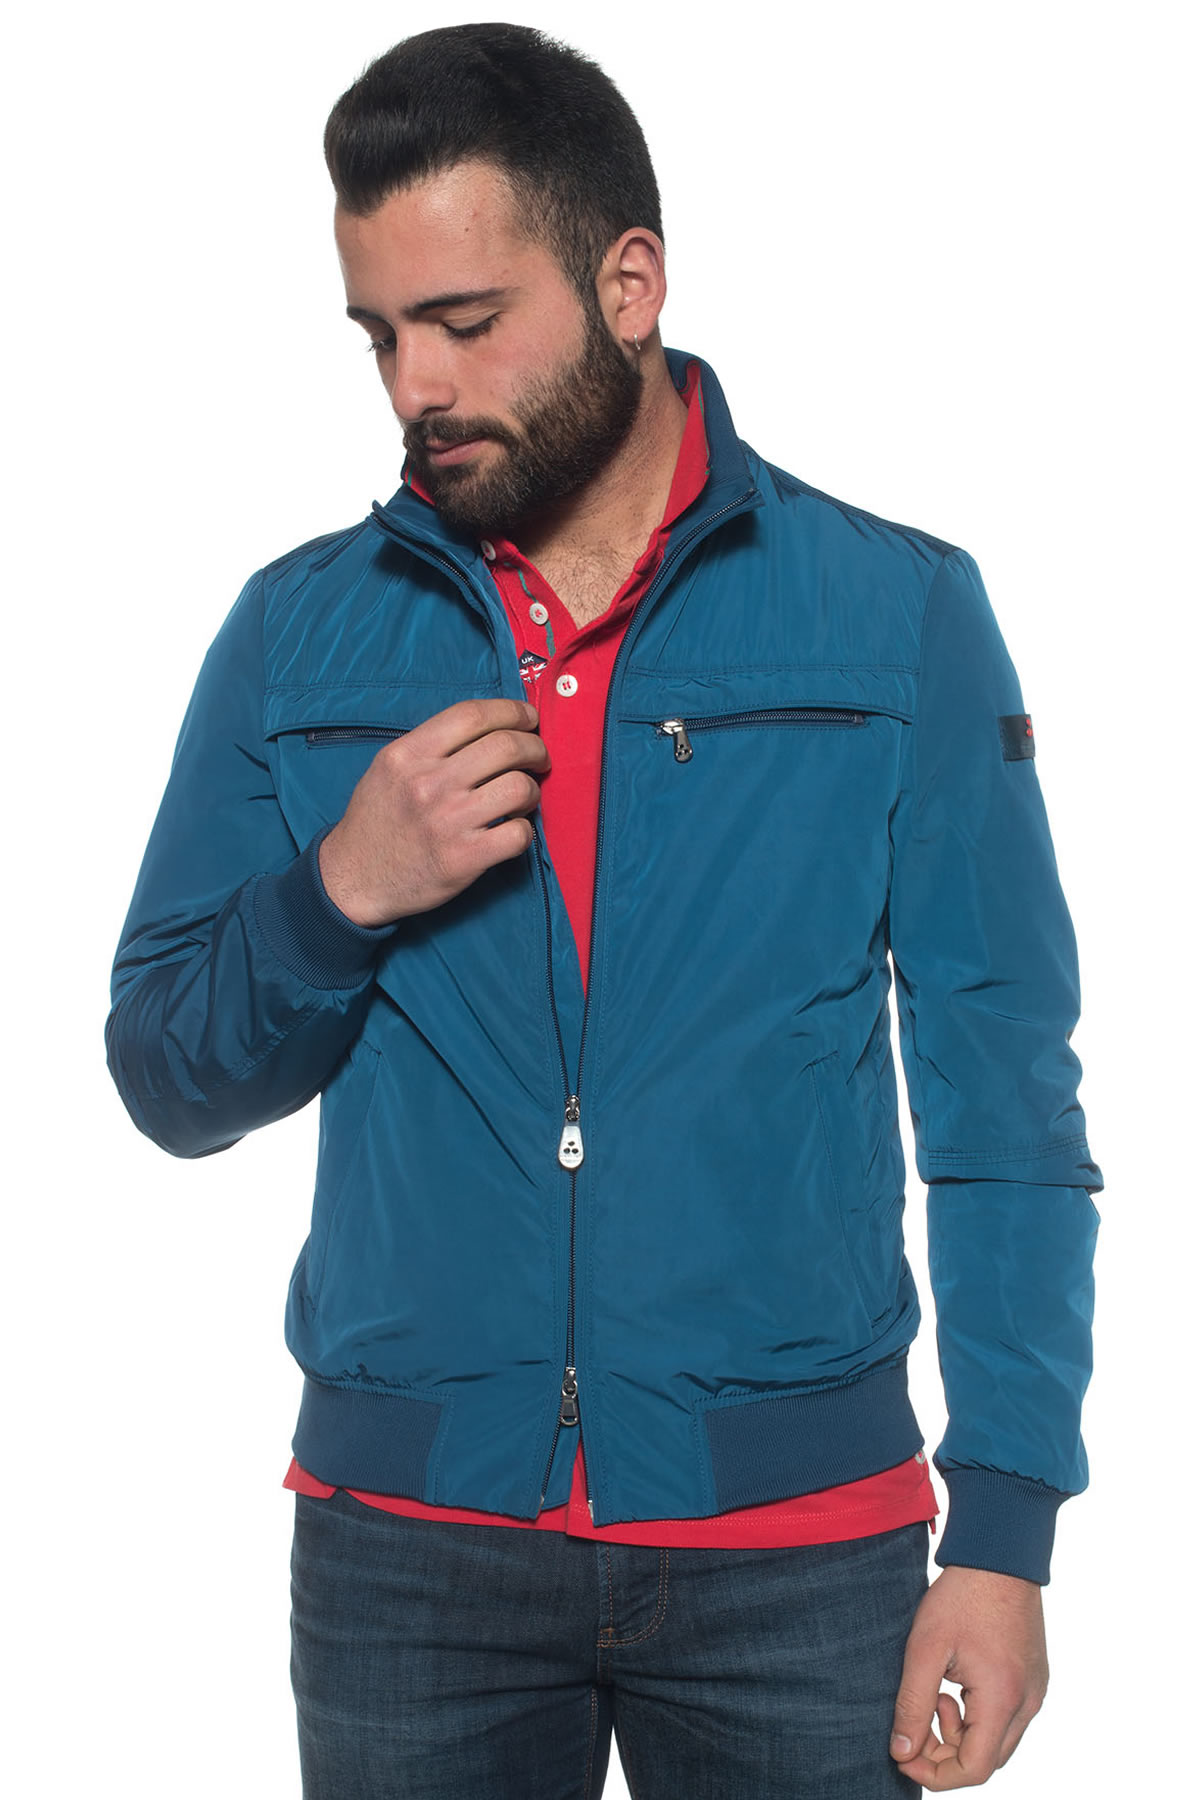 promo code 5e345 3810a Bomber jacket